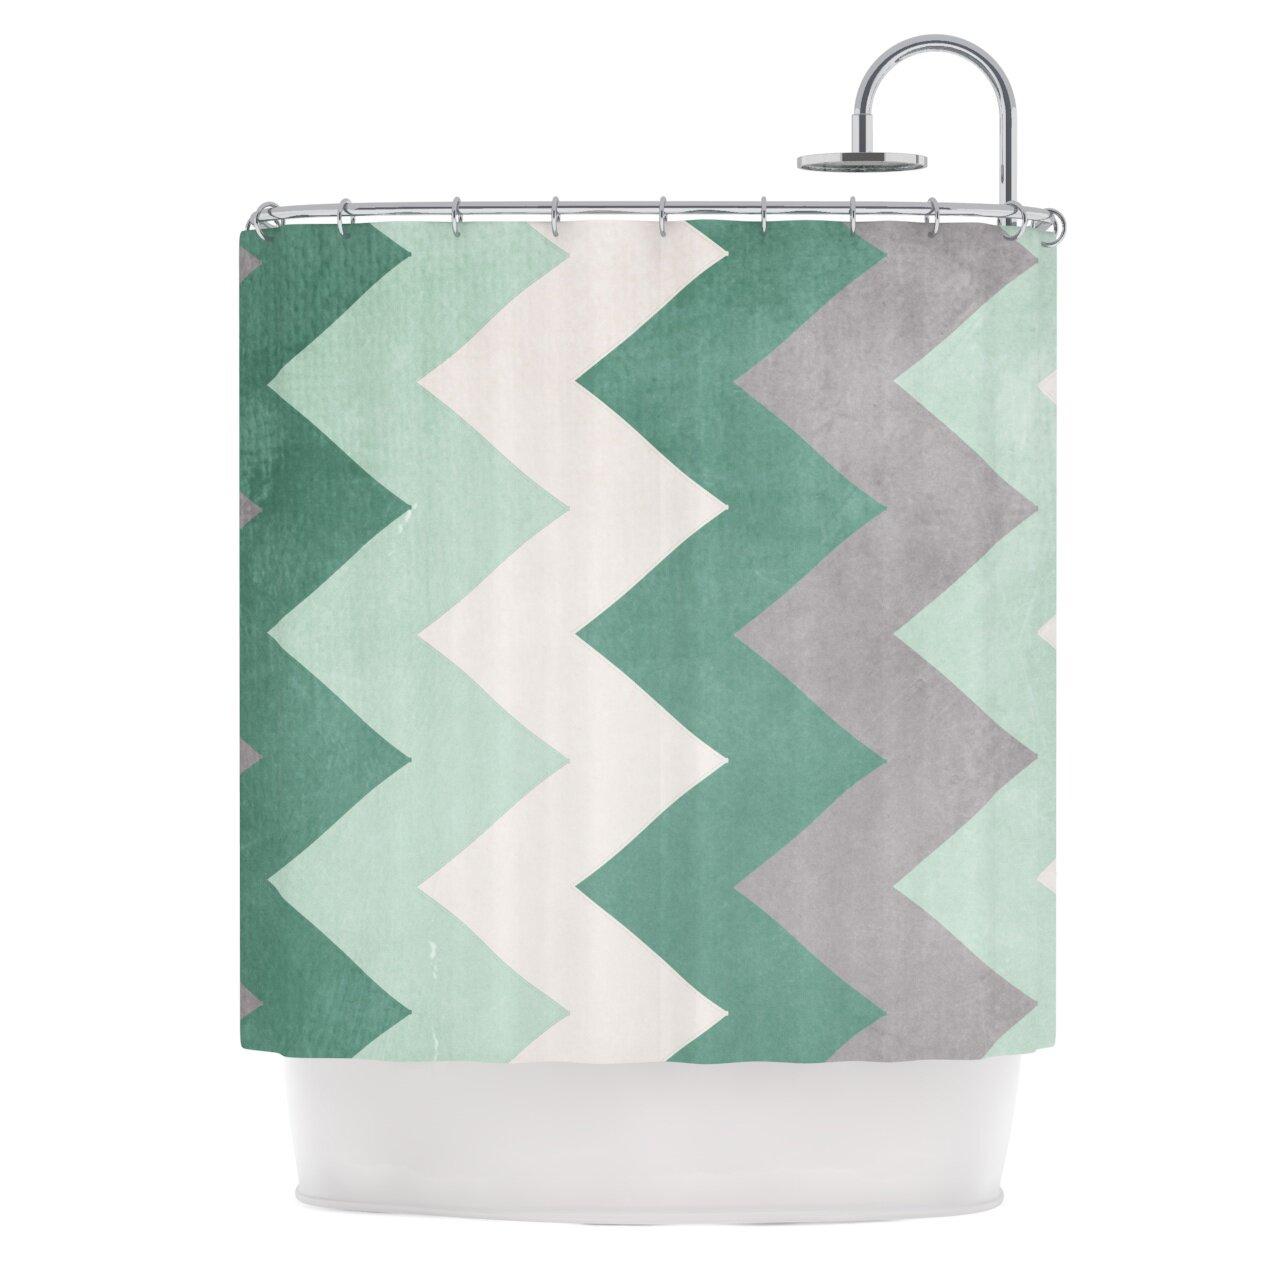 Winter shower curtain - Winter Shower Curtain